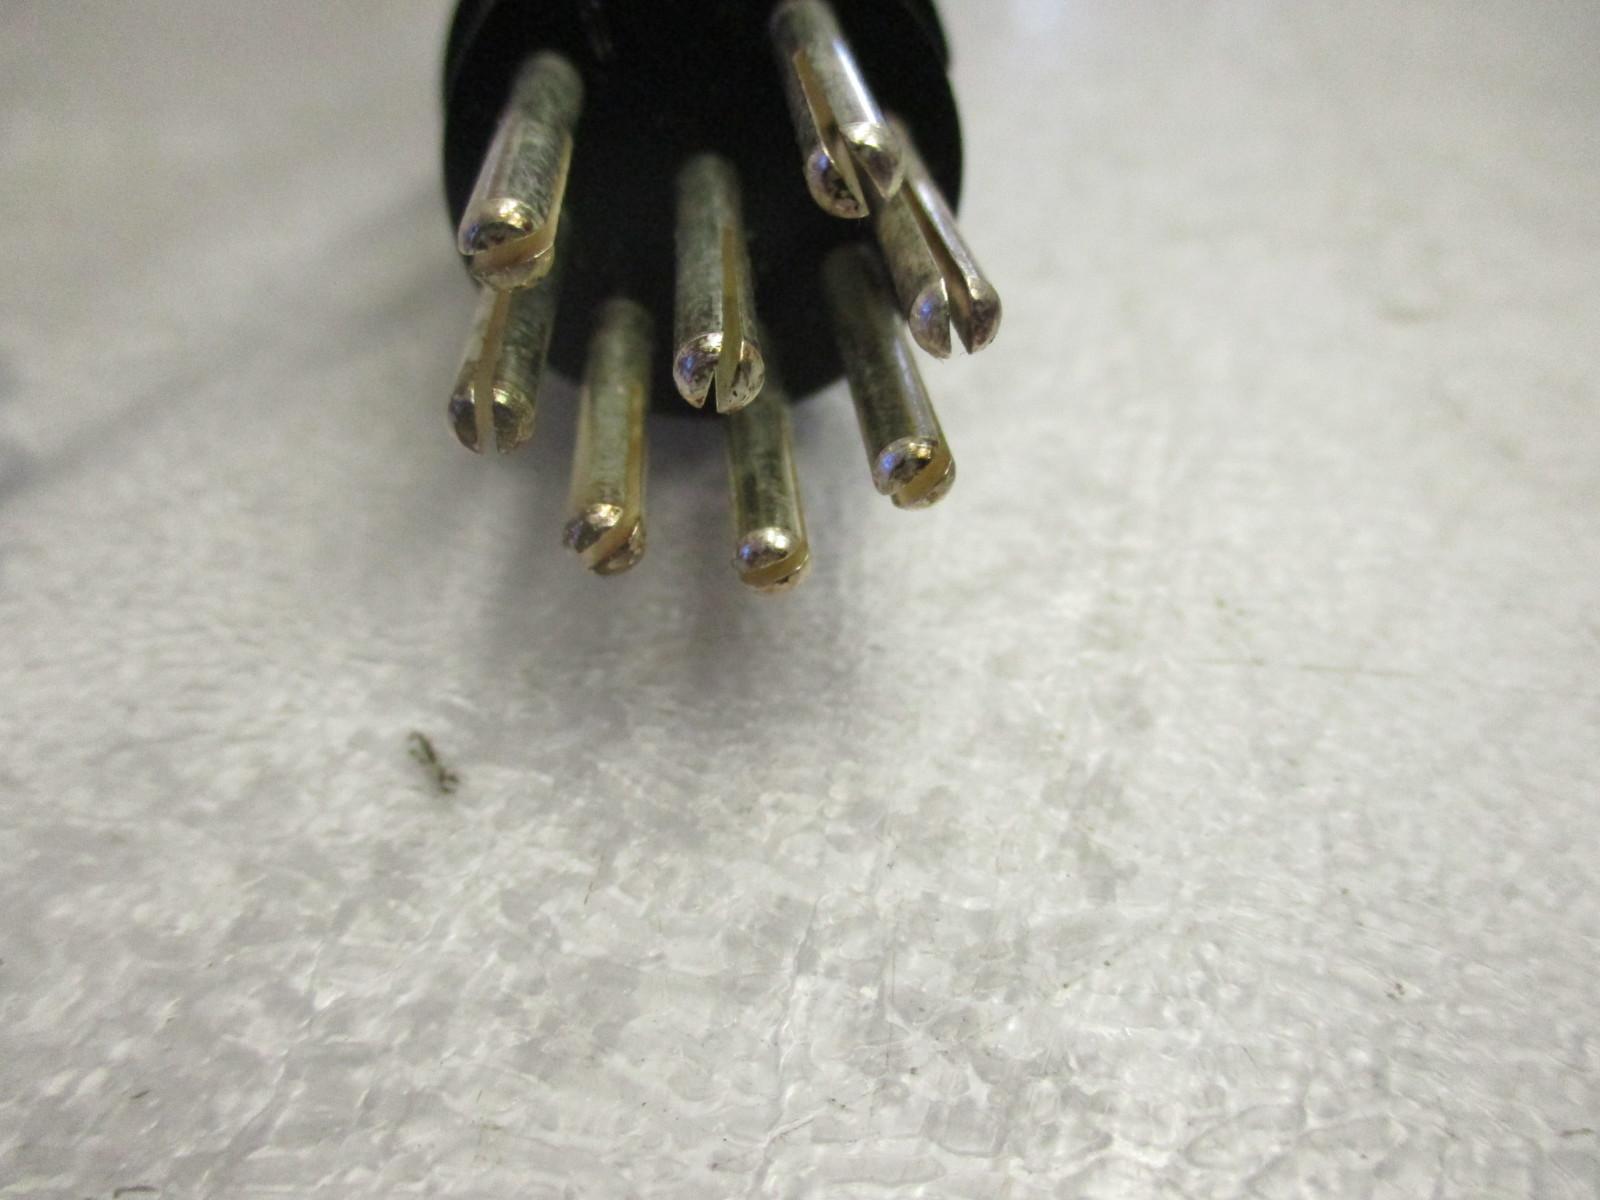 A new mercury quicksilver wire harness extension